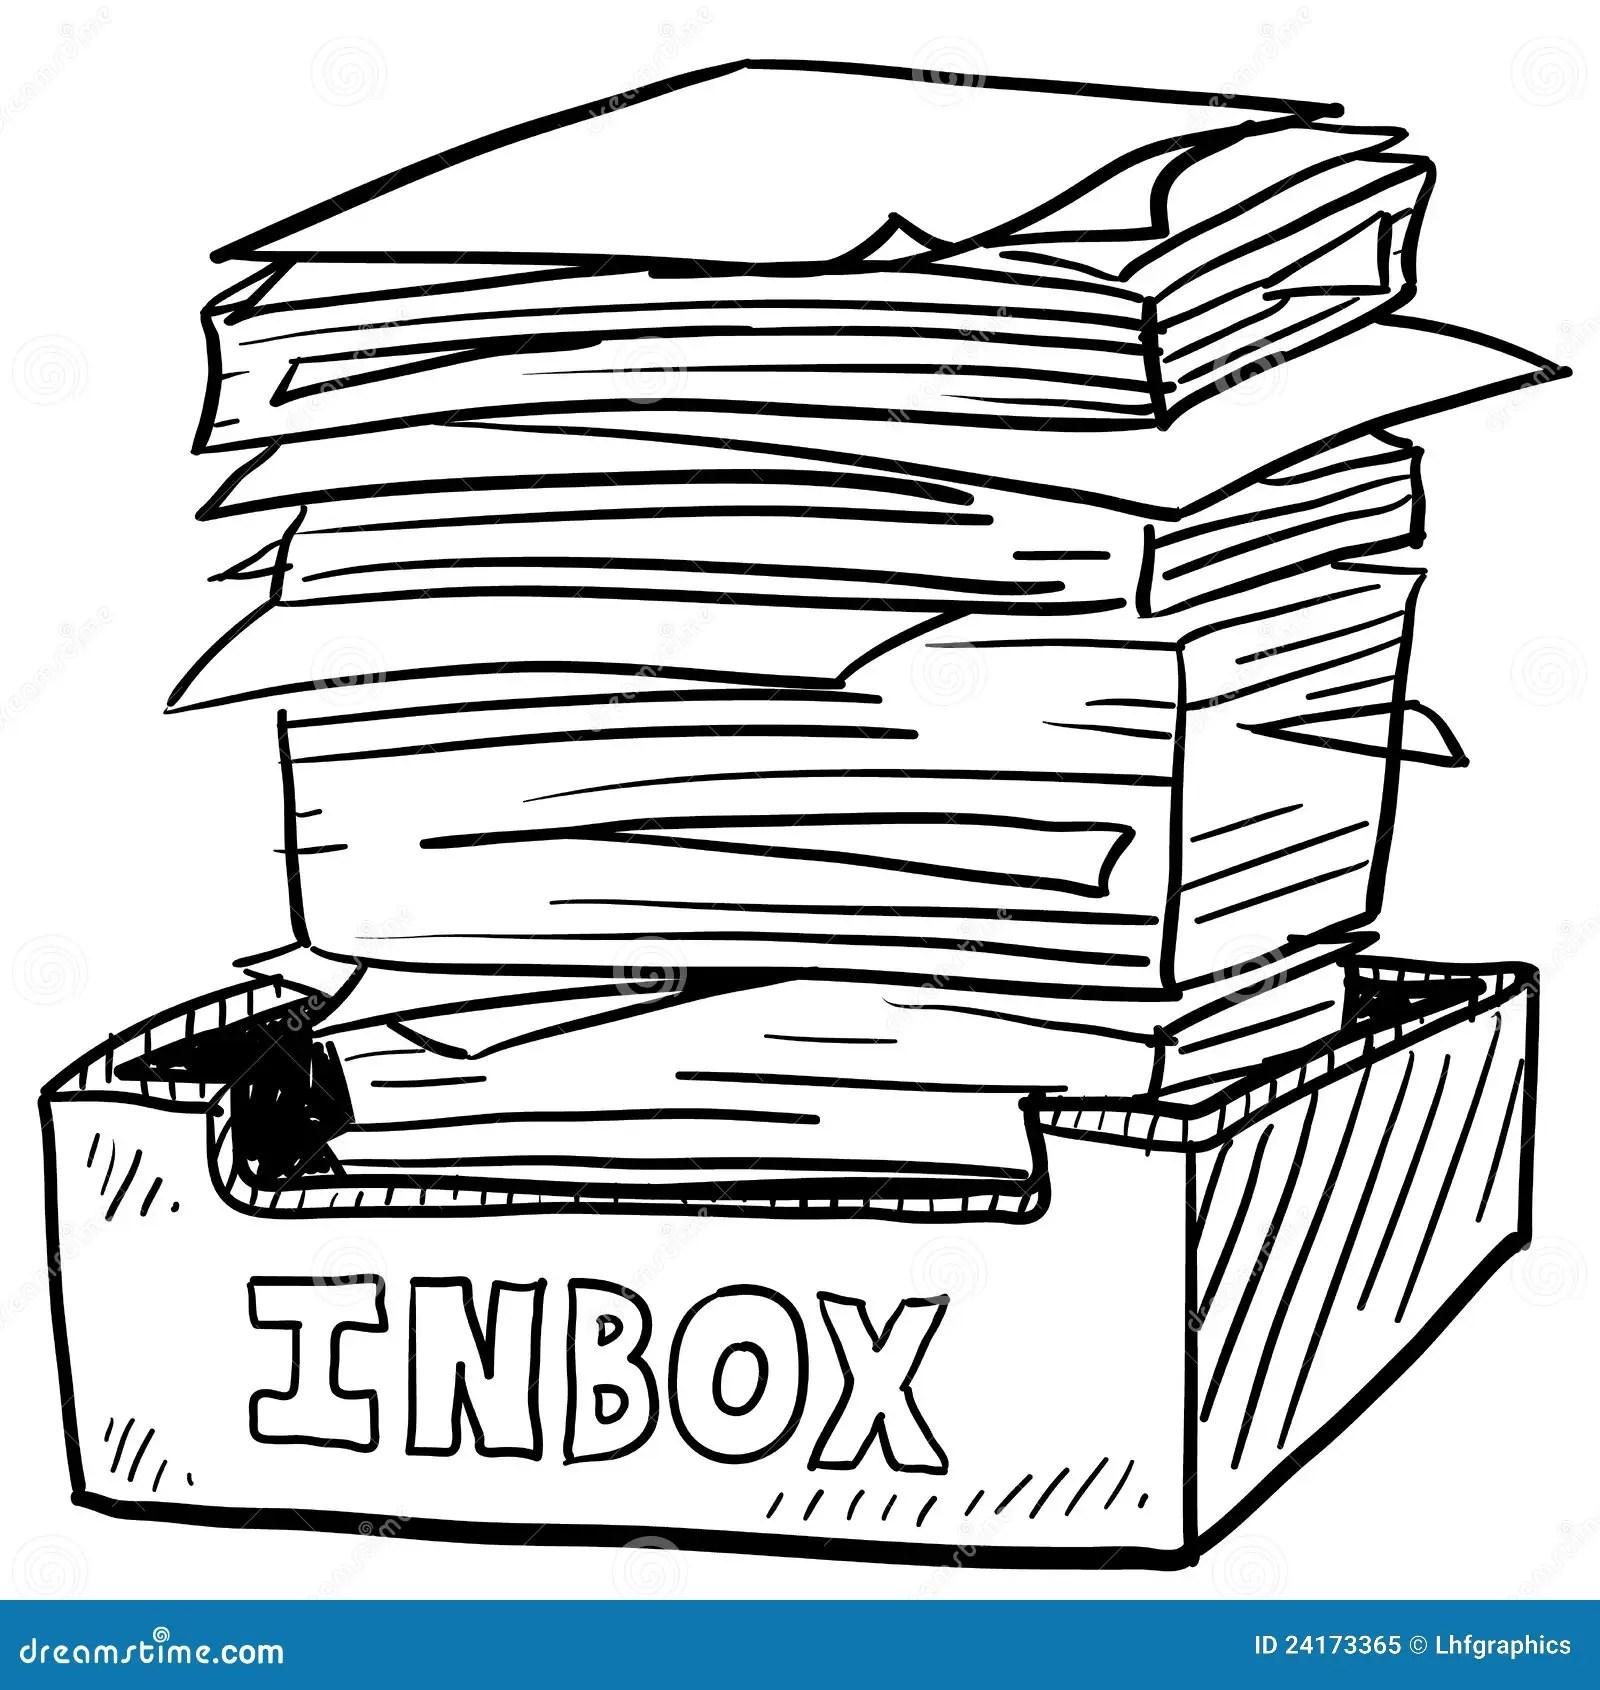 Overstuffed Inbox Work Stress Sketch Royalty Free Stock